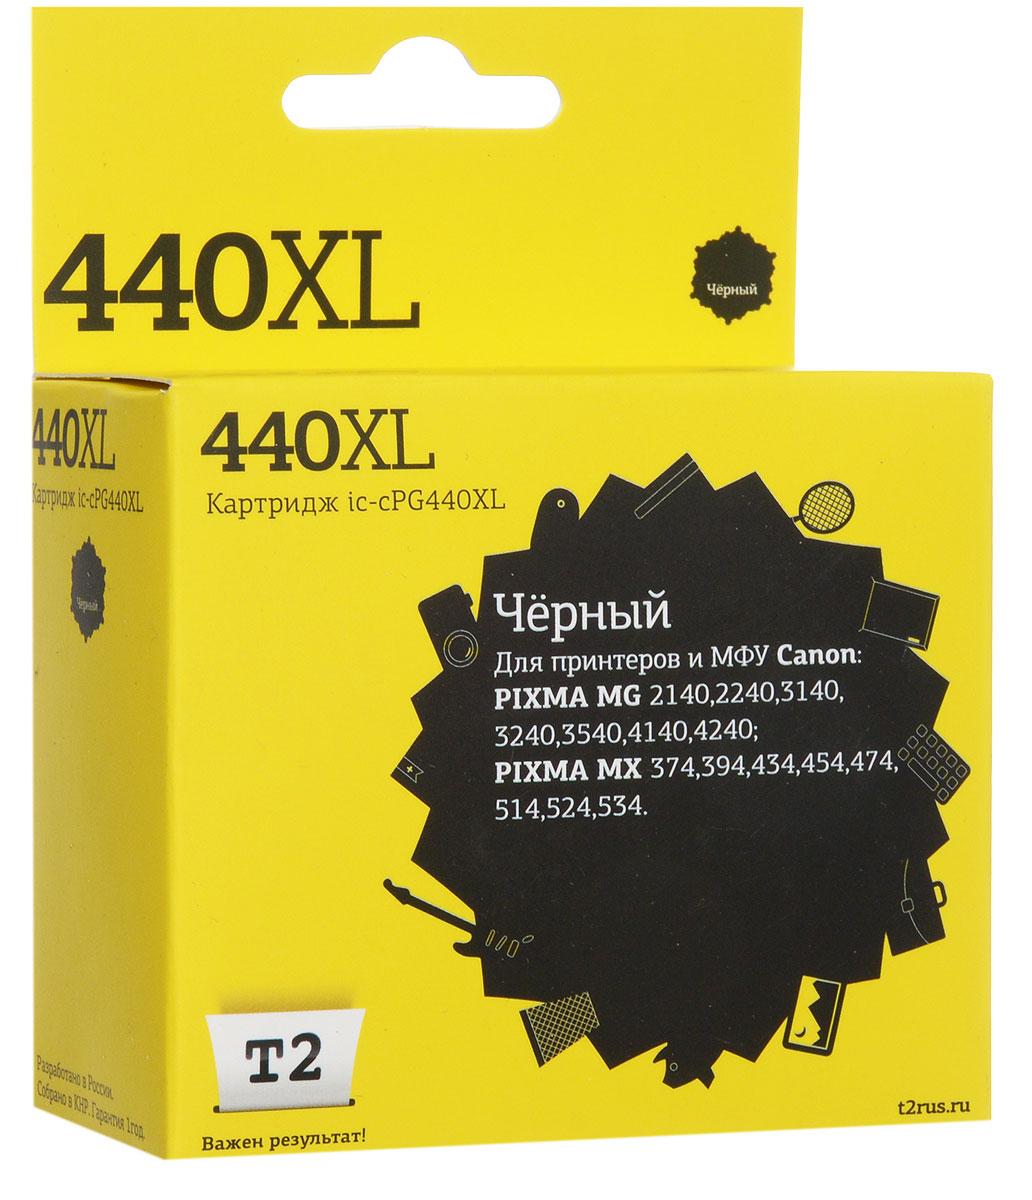 T2 IC-CPG440XL картридж (аналог PG-440 XL) для Canon PIXMA MG2140/3140/3540/MX394/434/474, Black